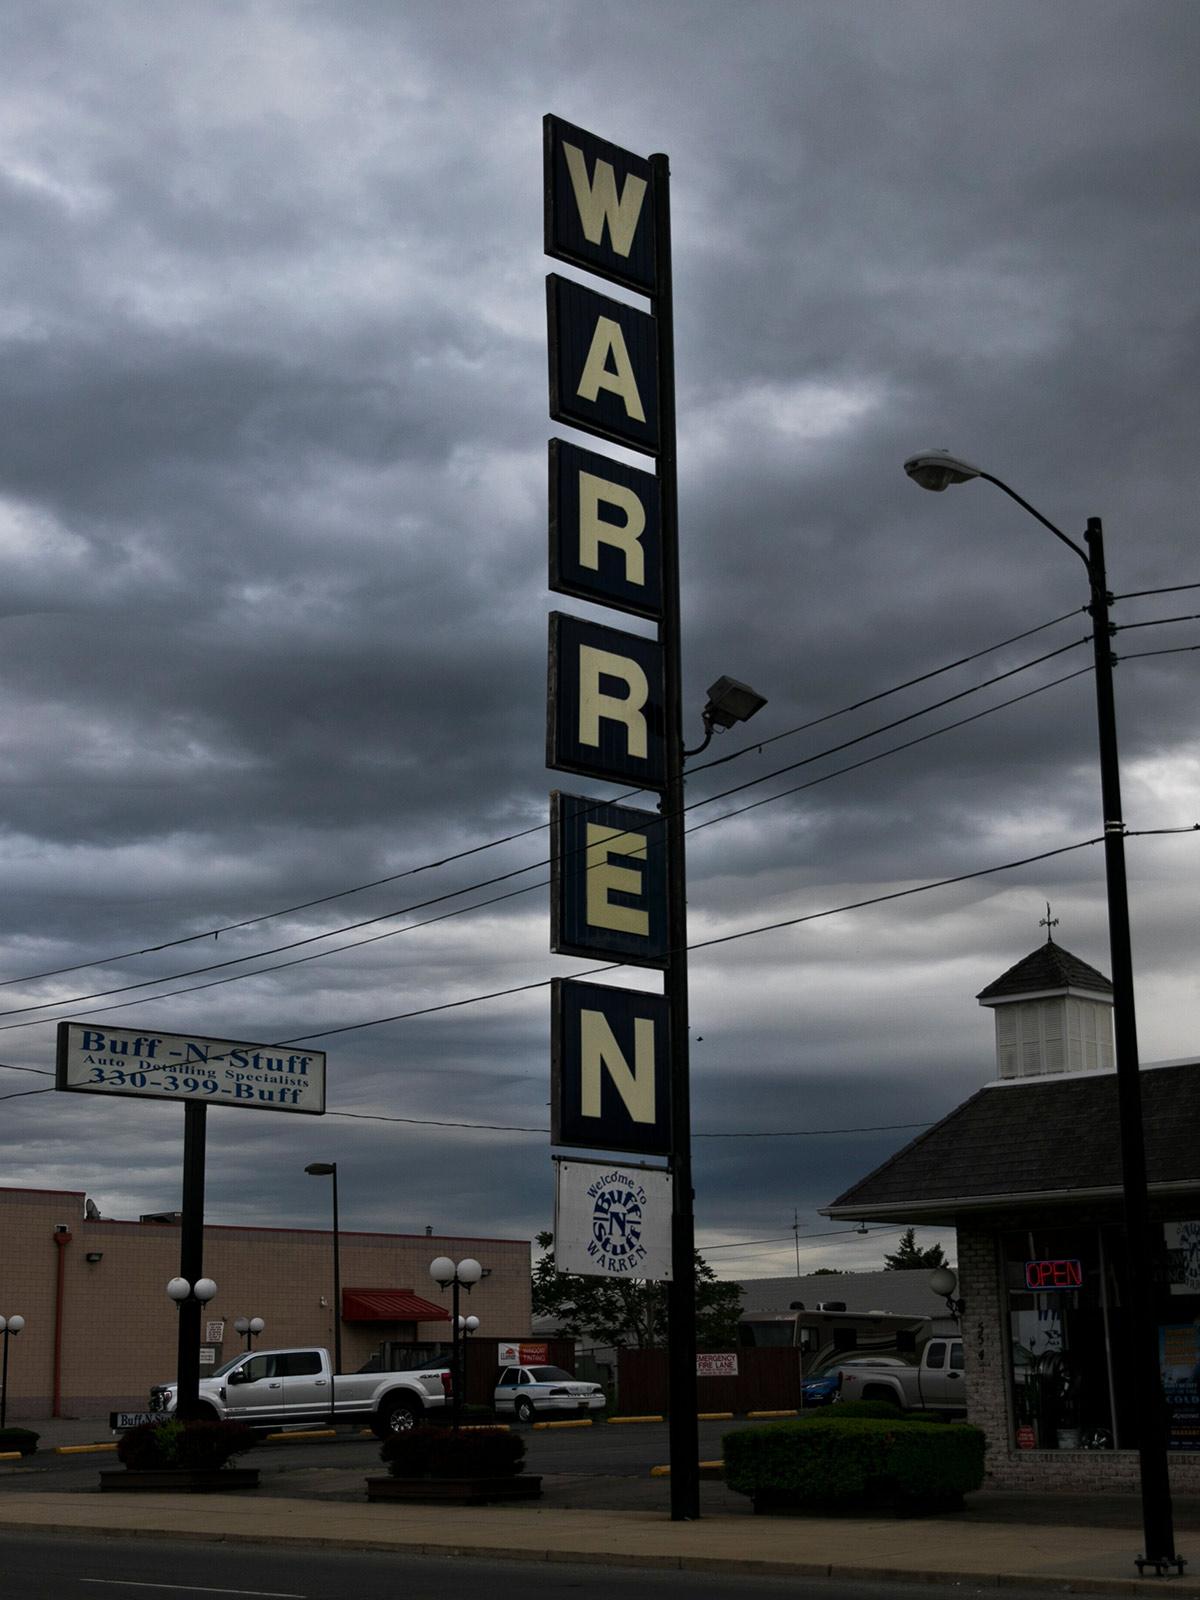 Portrait of Warren, Ohio—a microcosm of the Rust Belt struggle